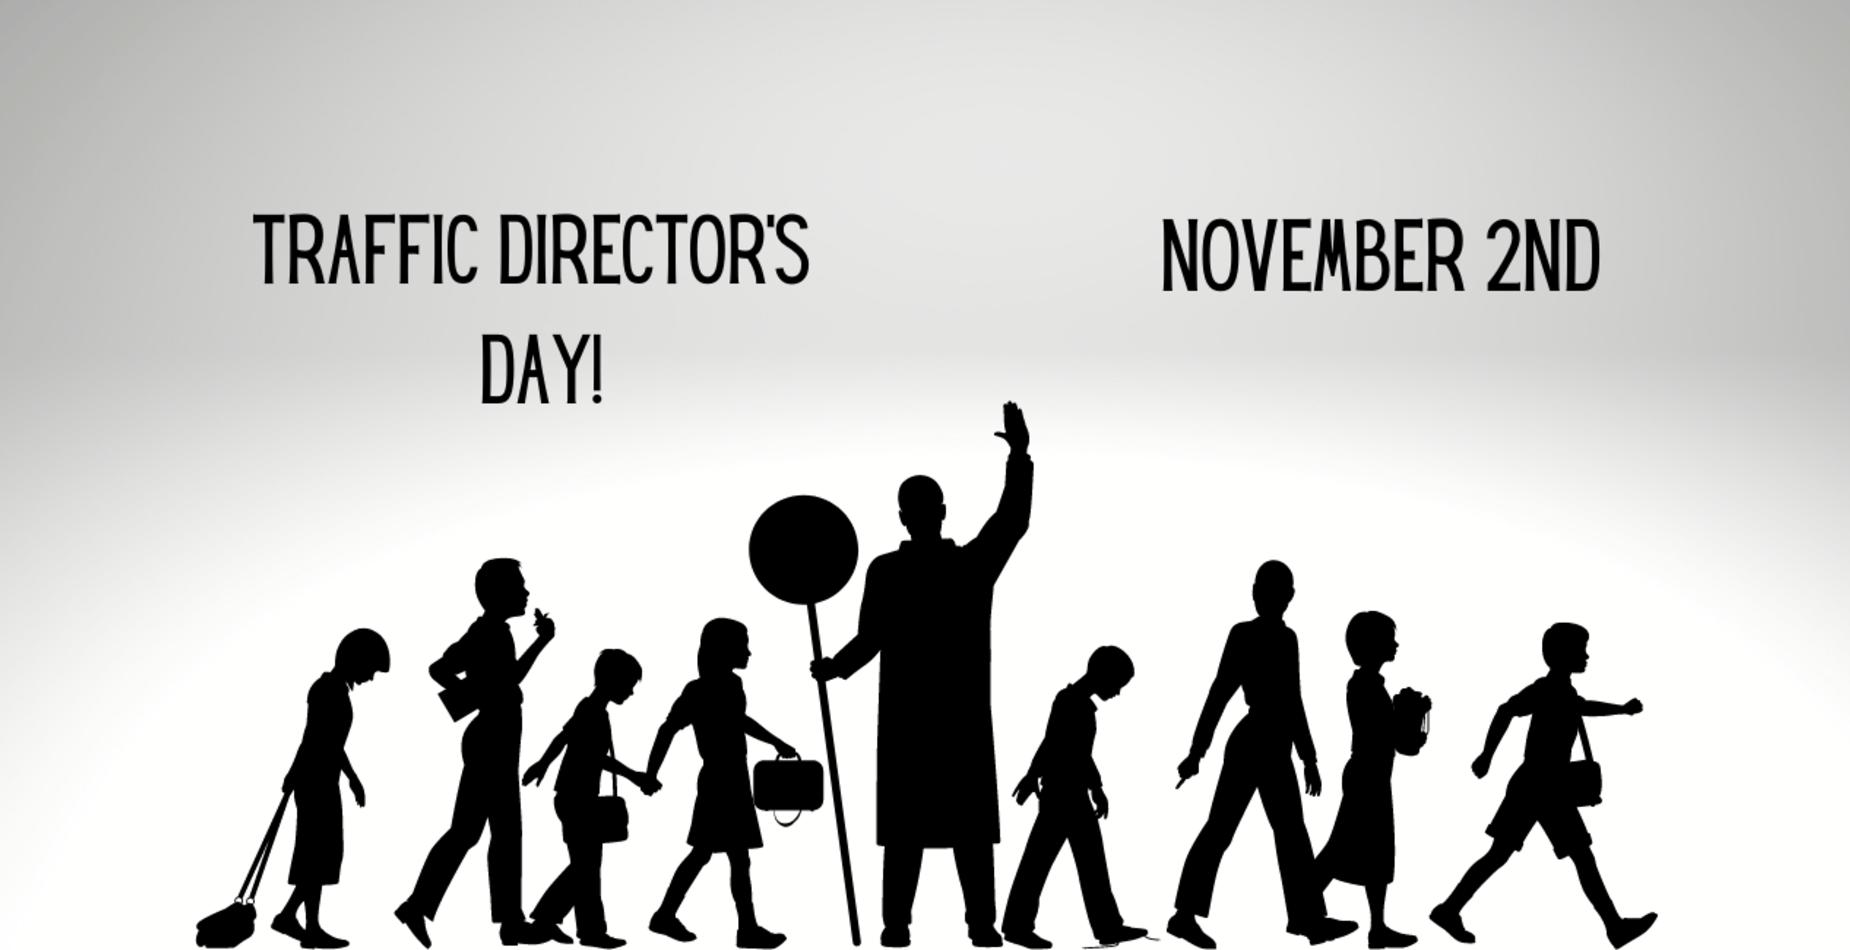 Traffic Director's Day